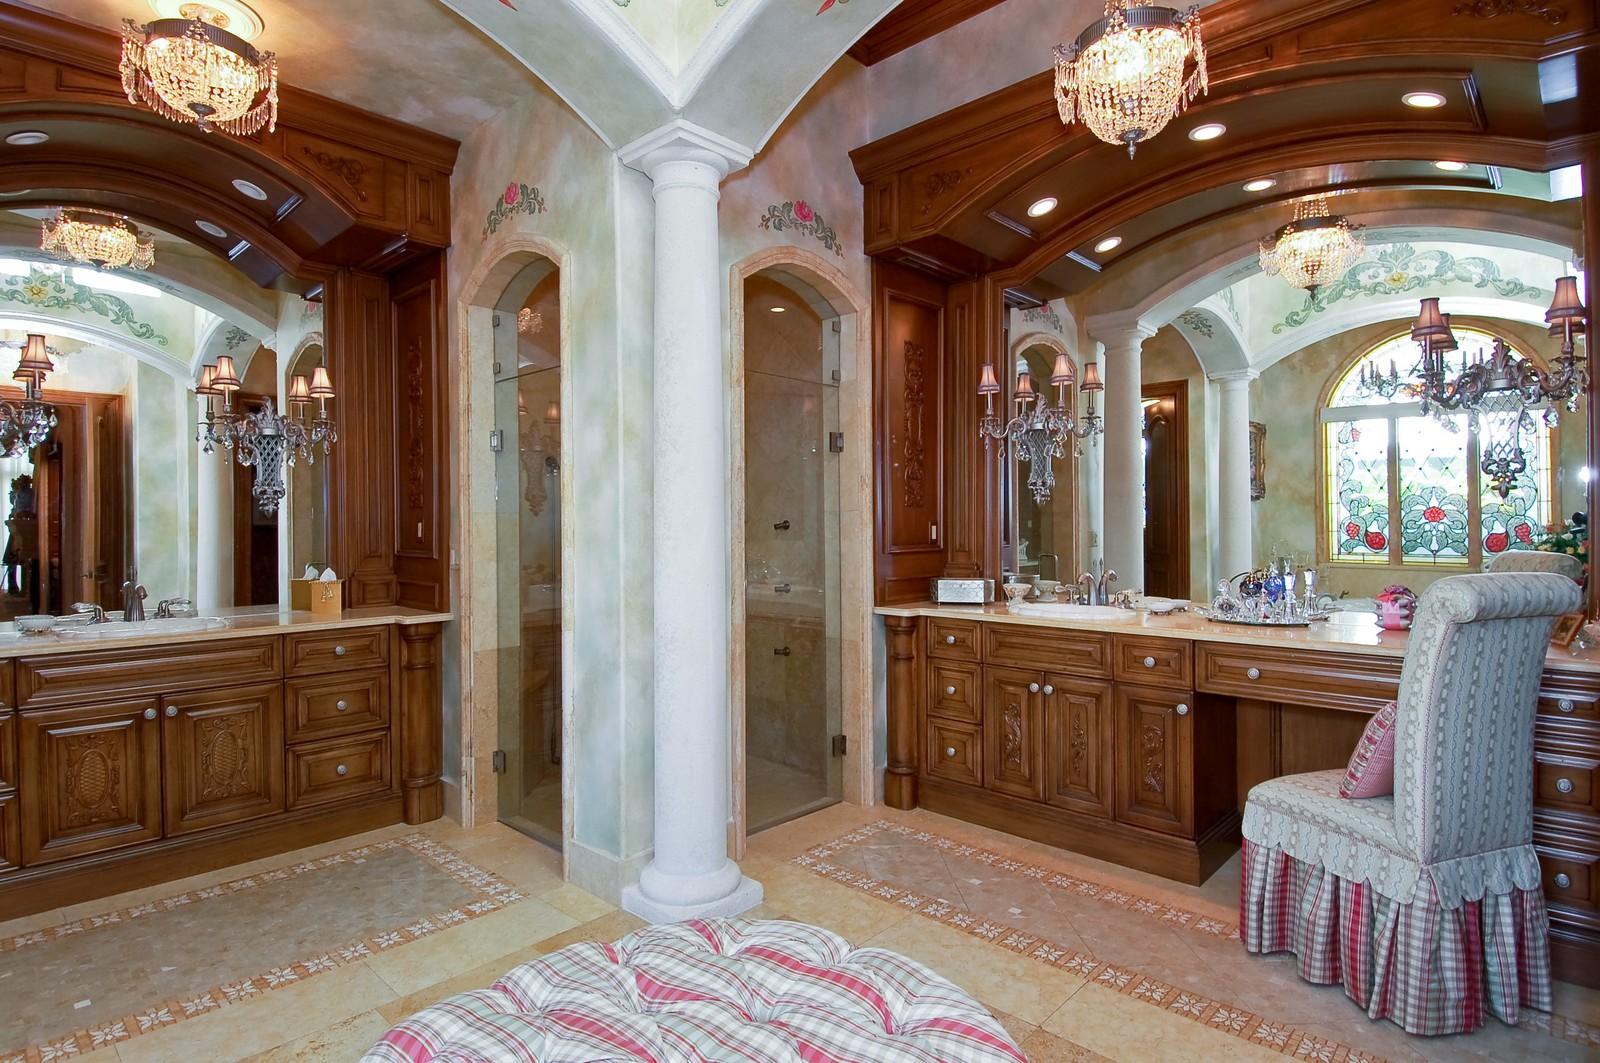 Real Estate Photography - 215 Royal Palm Way, Boca Raton, FL, 33432 - Master Bathroom